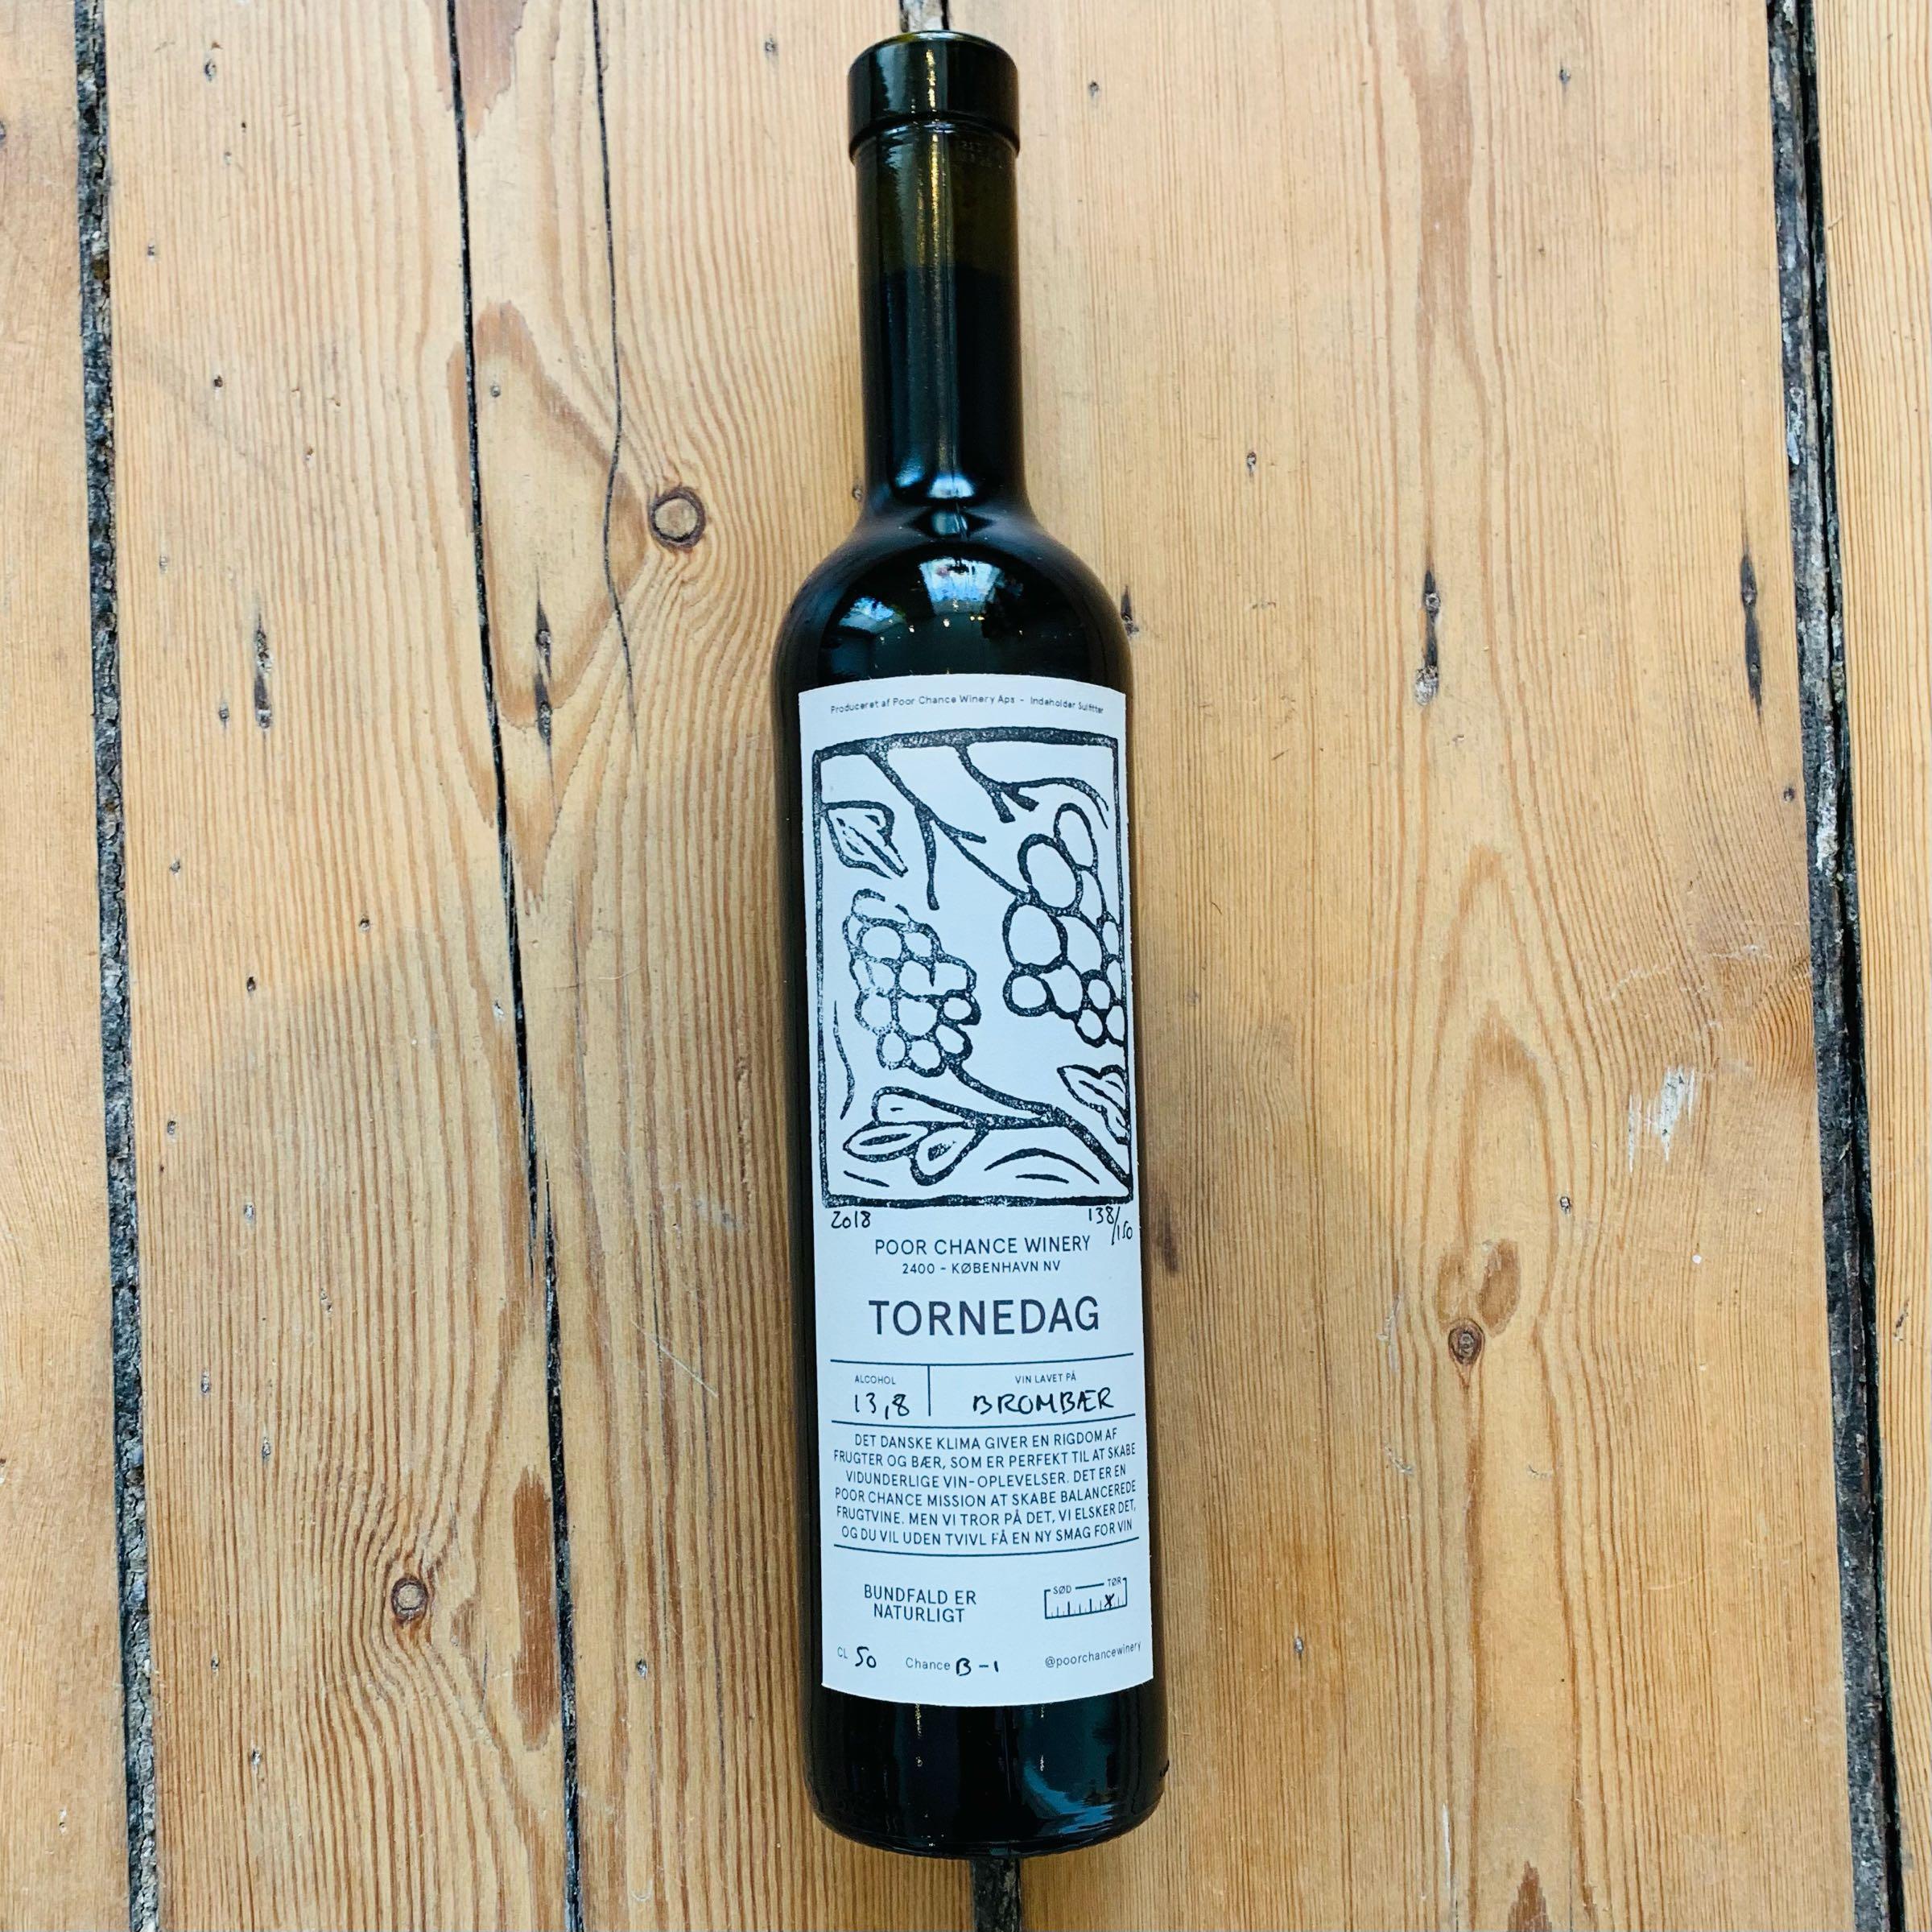 Poor Chance Winery Tornedag 2018